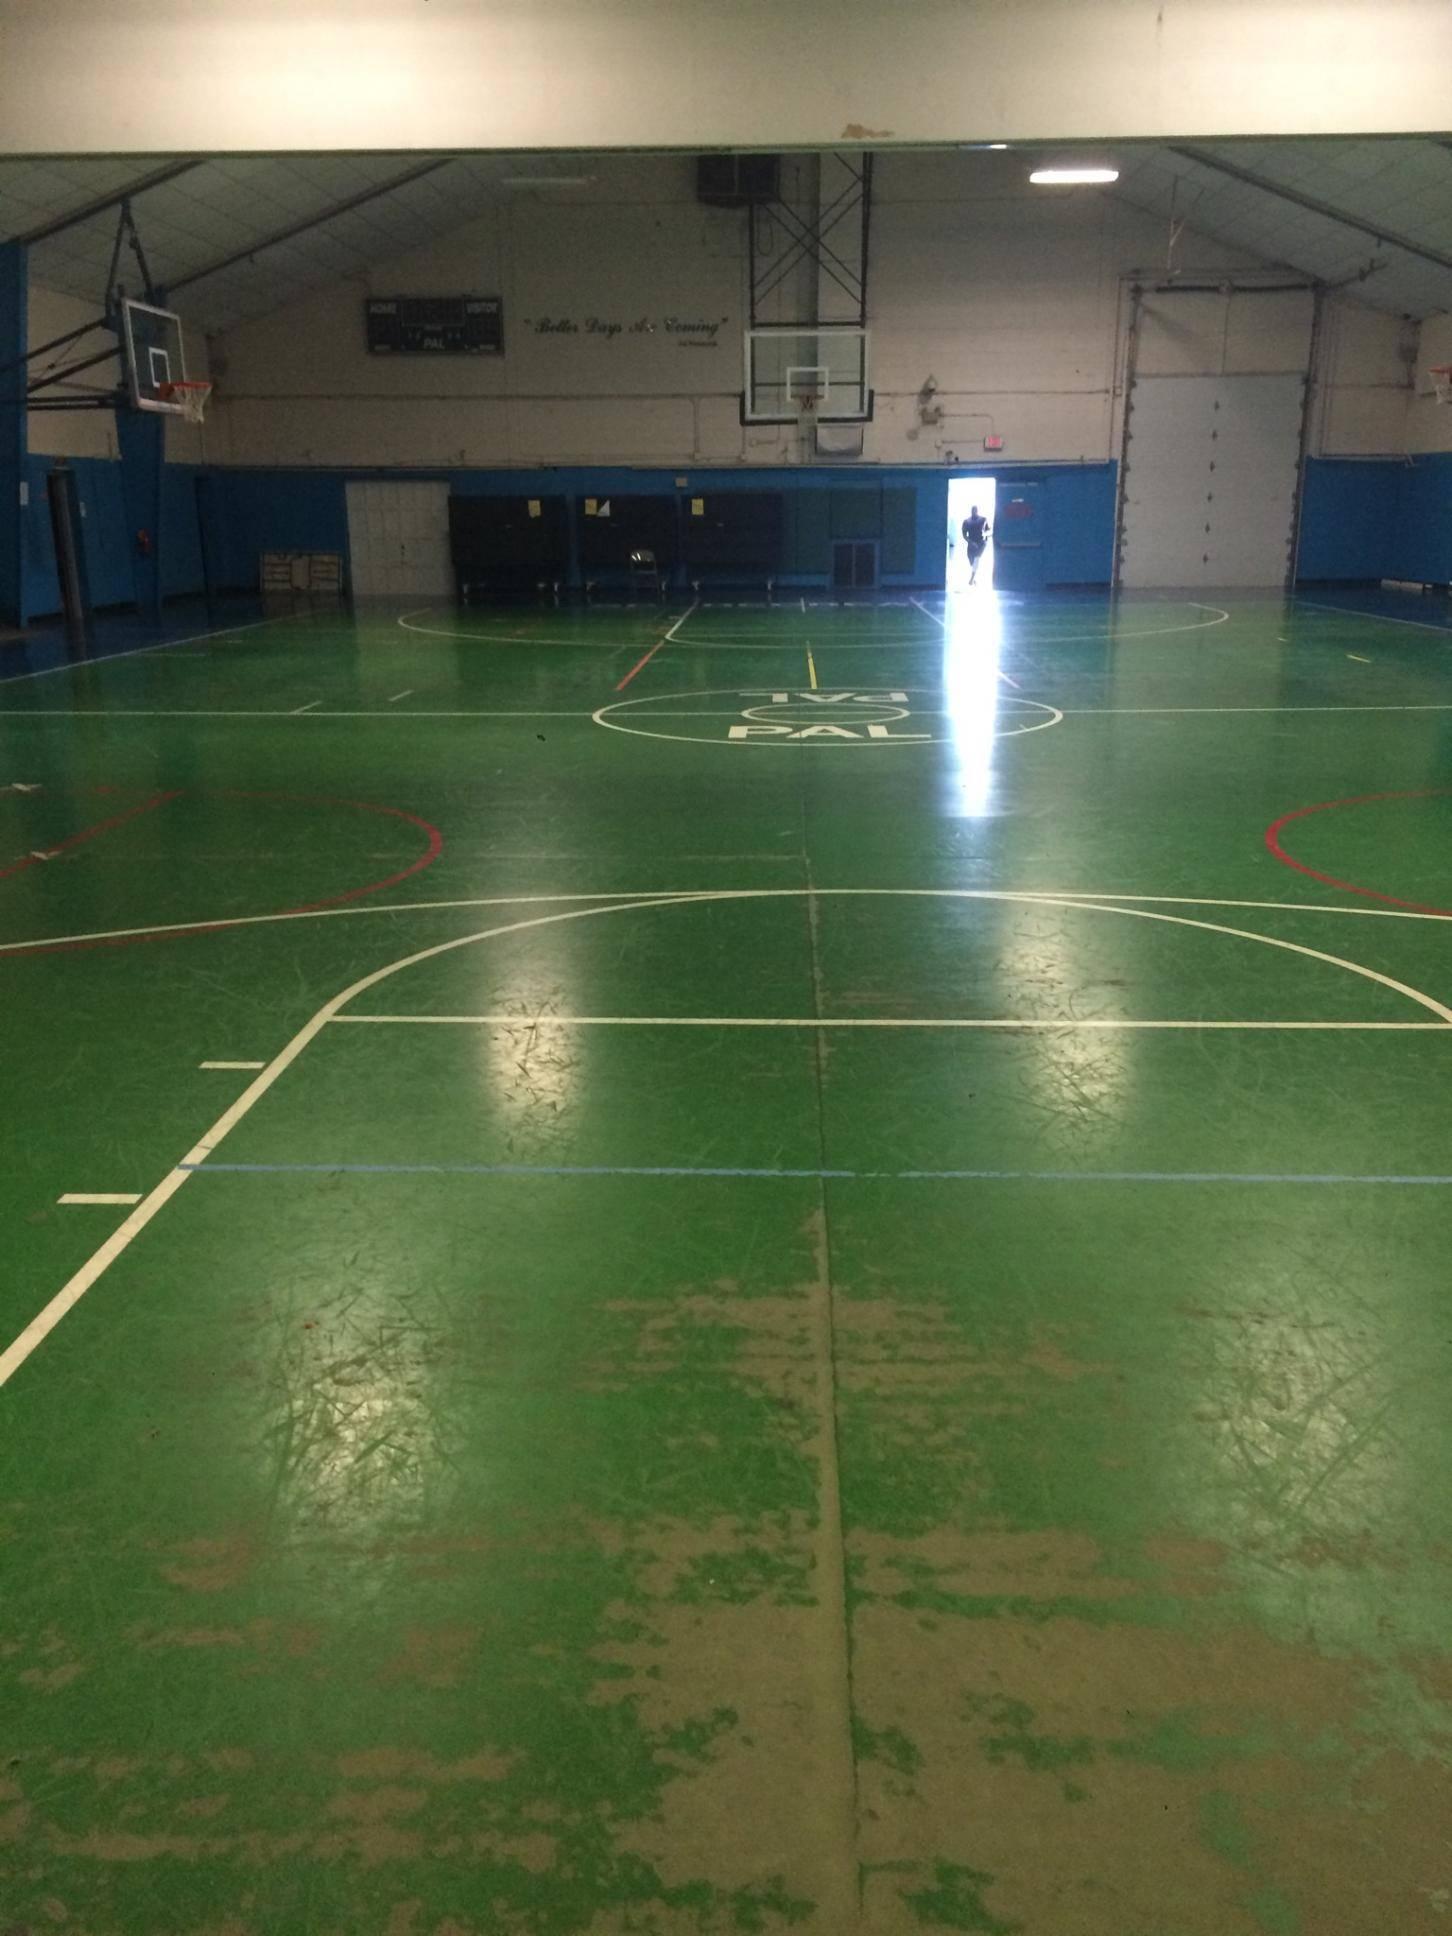 59d6730daf1b5584c27b_gym_floor_1.jpg